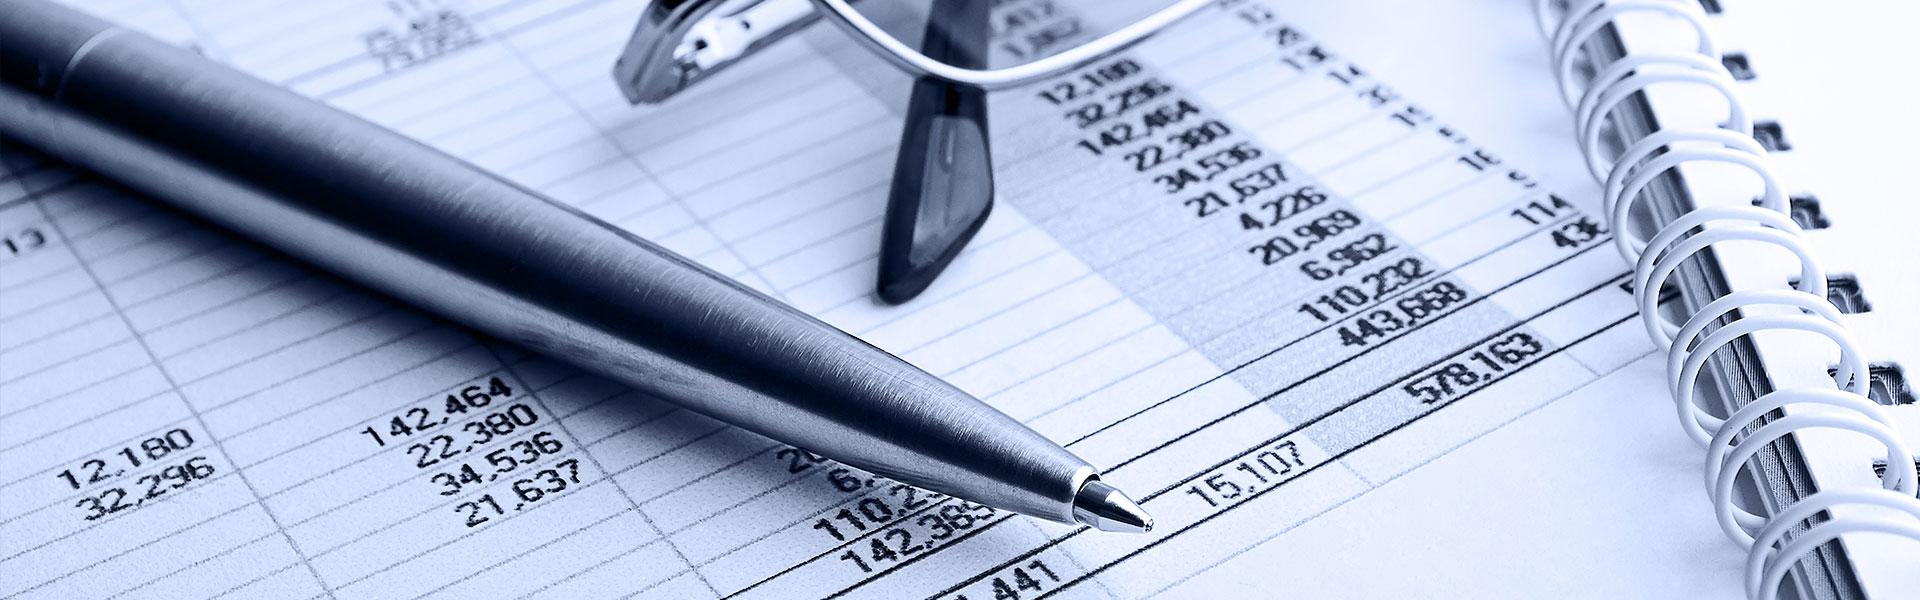 Firma contabilitate Bucuresti